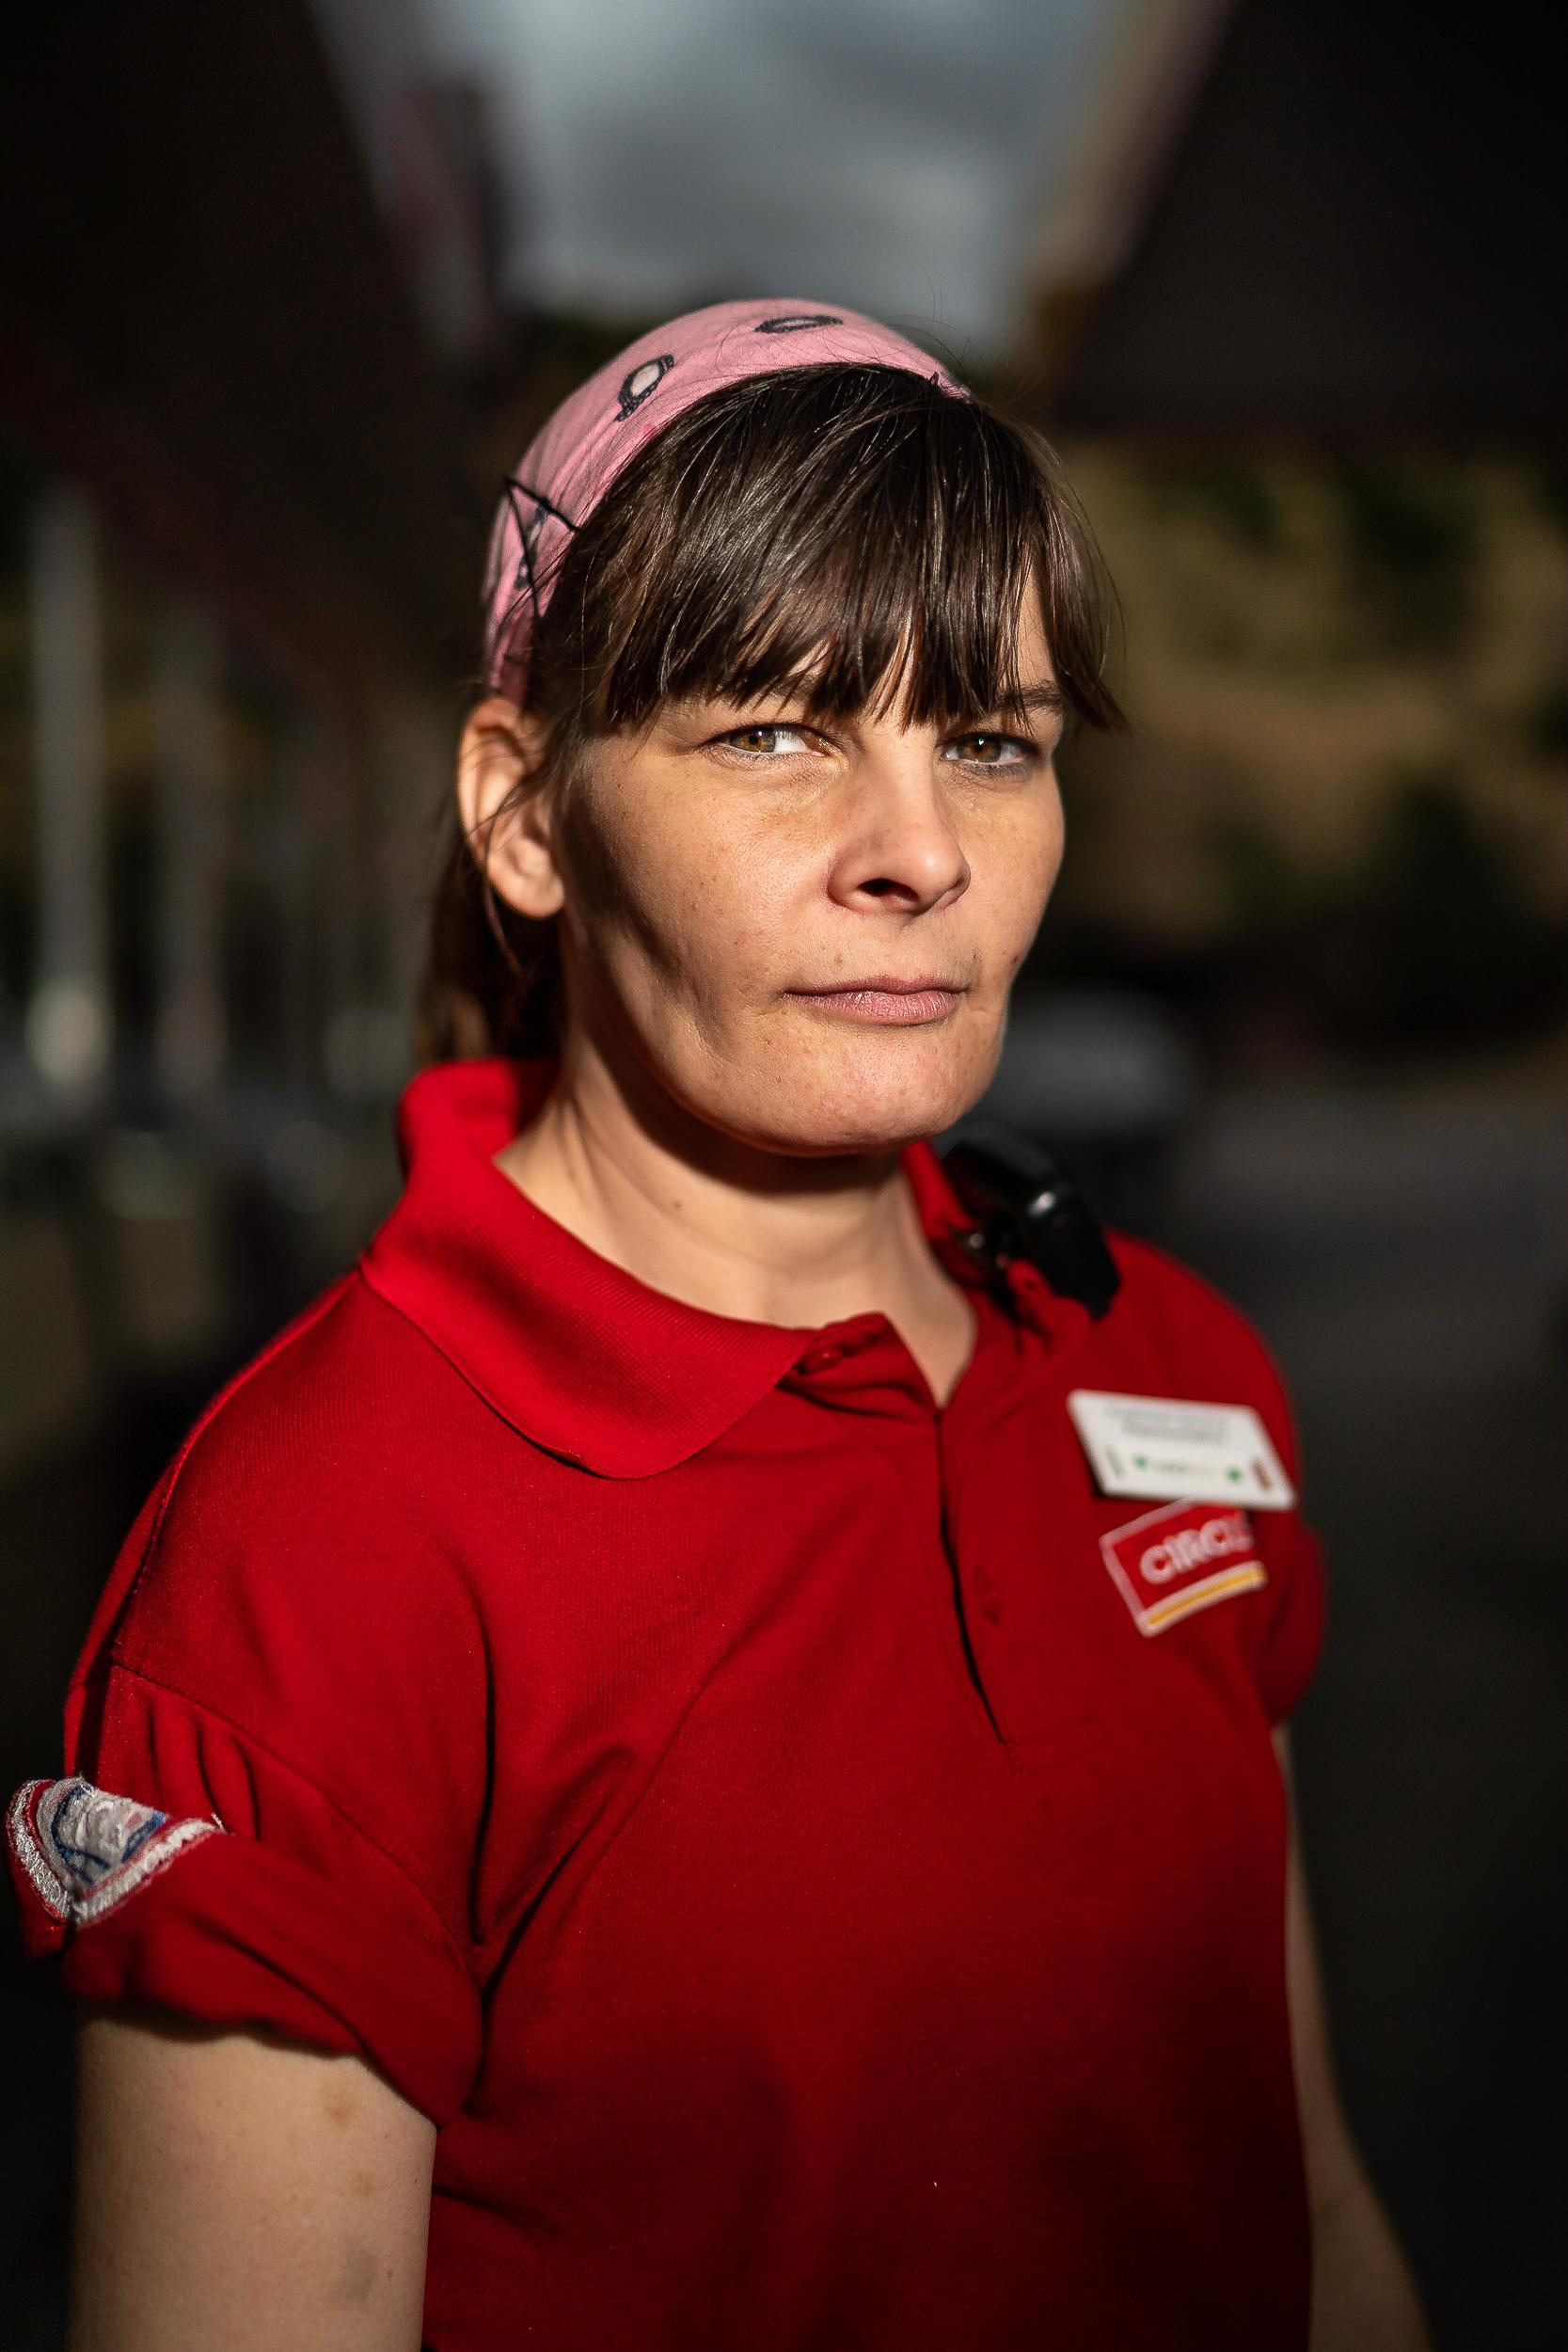 Andrea, Former Wild Fire Fighter, Arlington, Oregon, June, 2018.